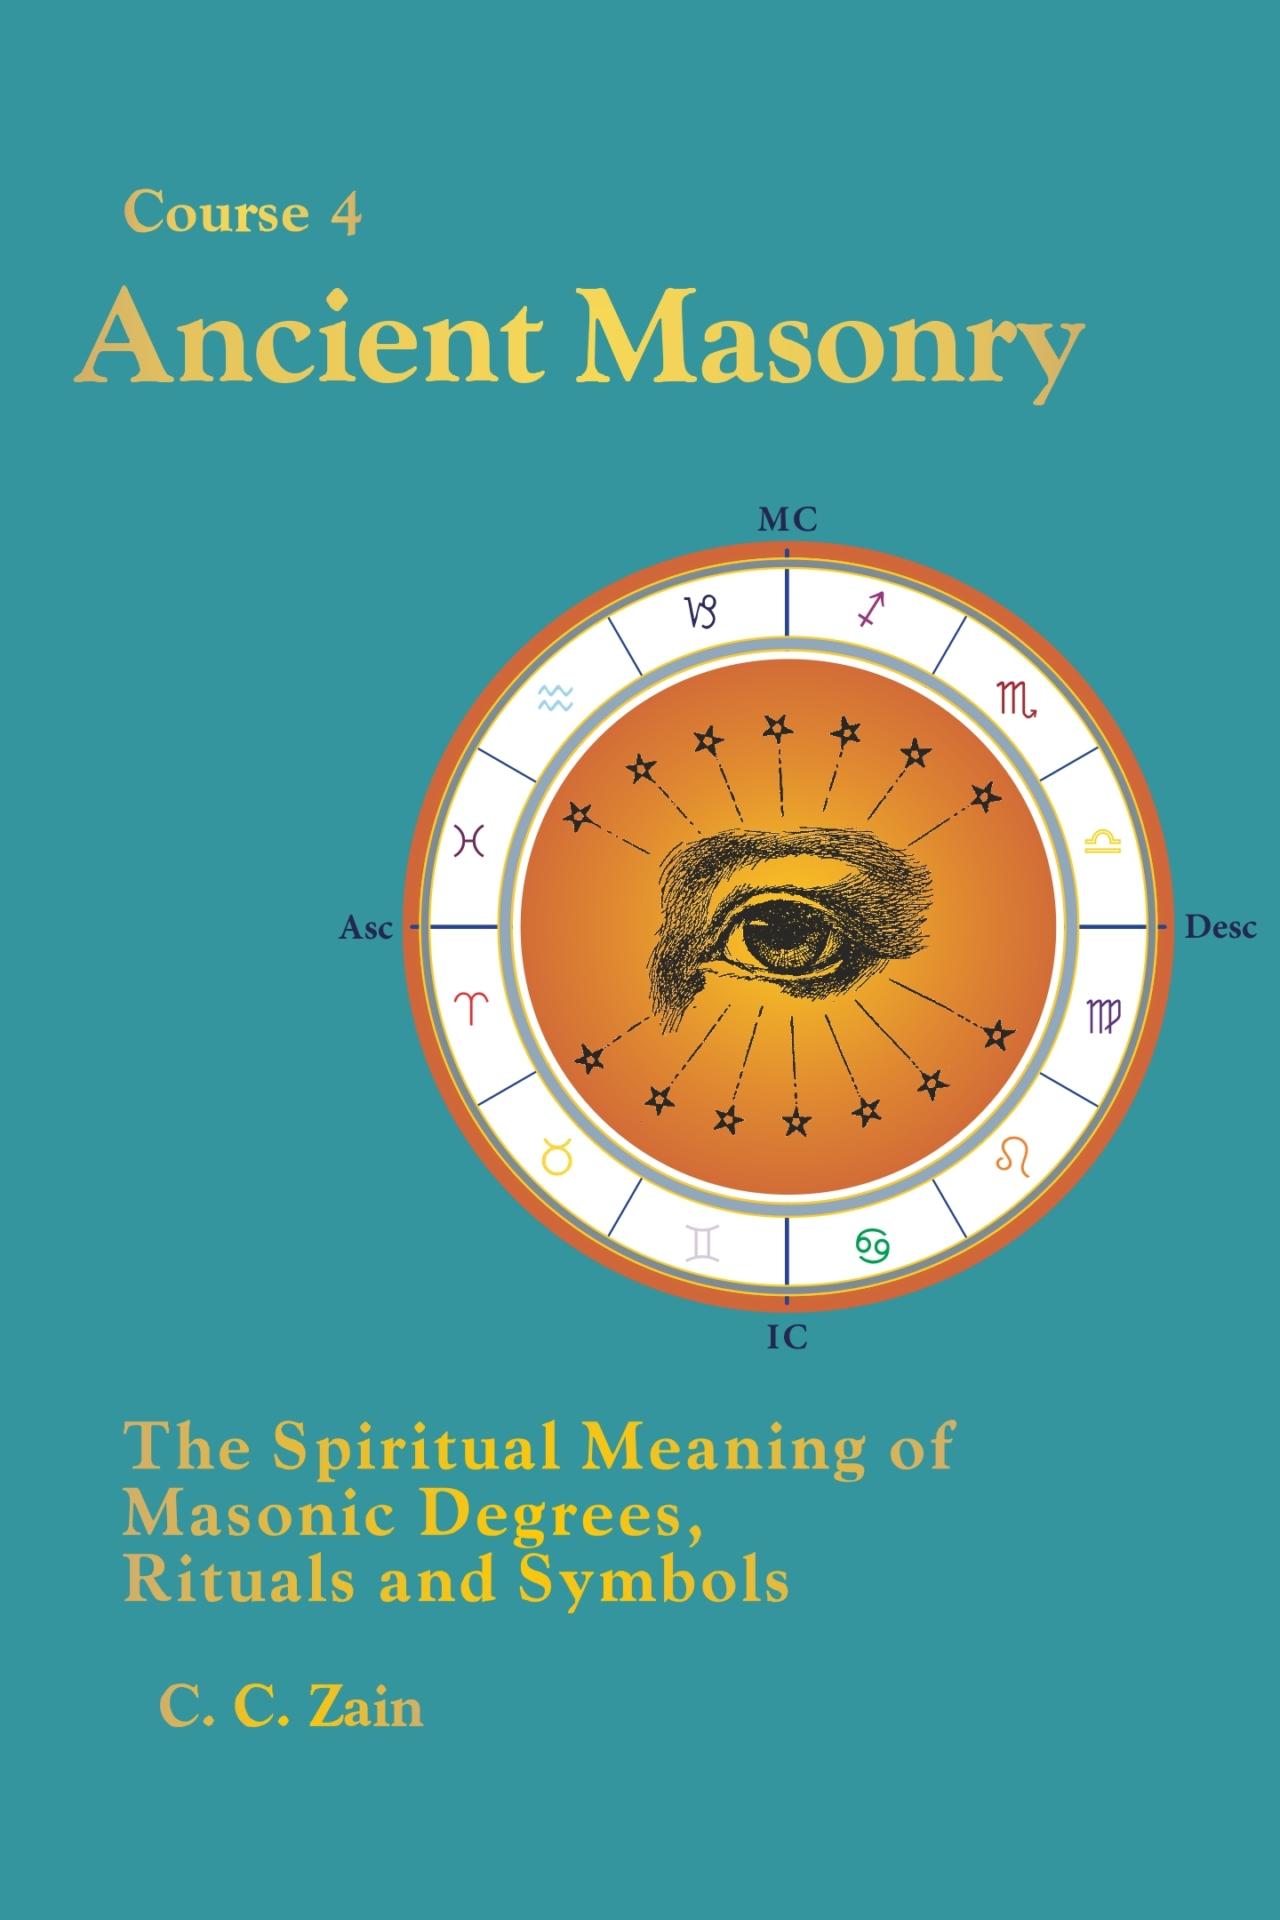 https://study.academyofhermeticarts.org/wp-content/uploads/2020/04/04_Ancient_Masonry_eBook_Cover-1280x1920.jpg